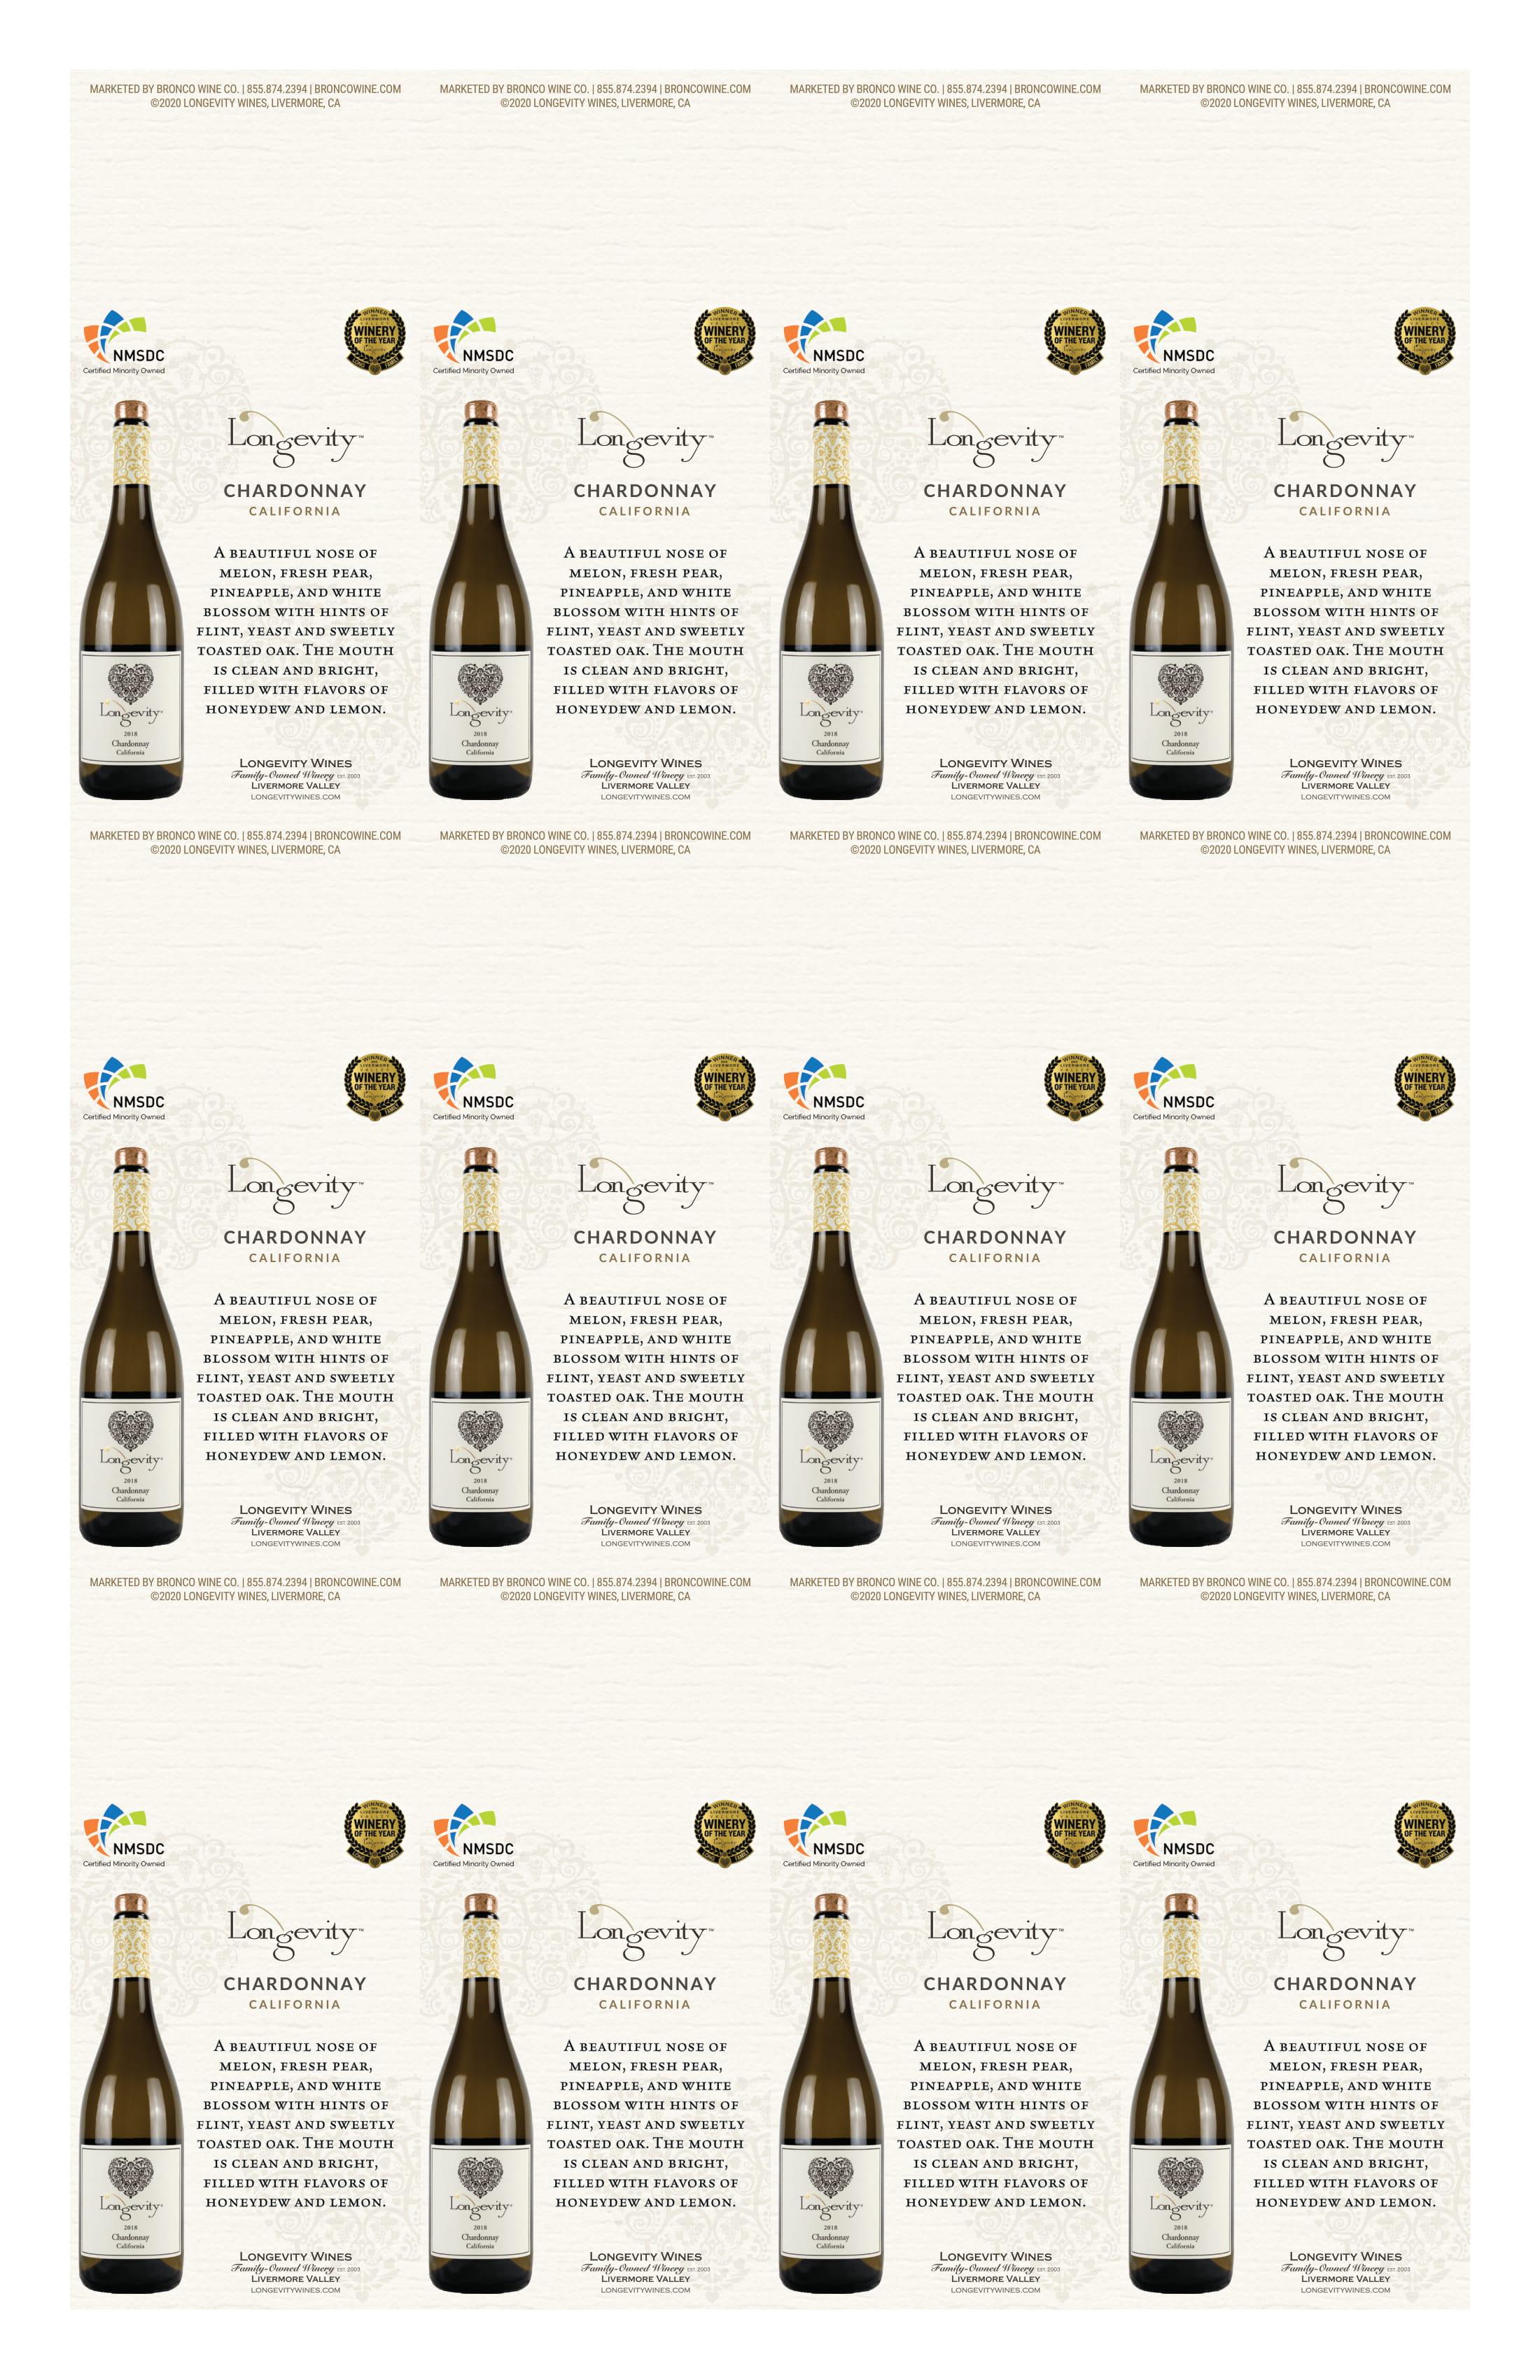 Longevity Chardonnay Necker